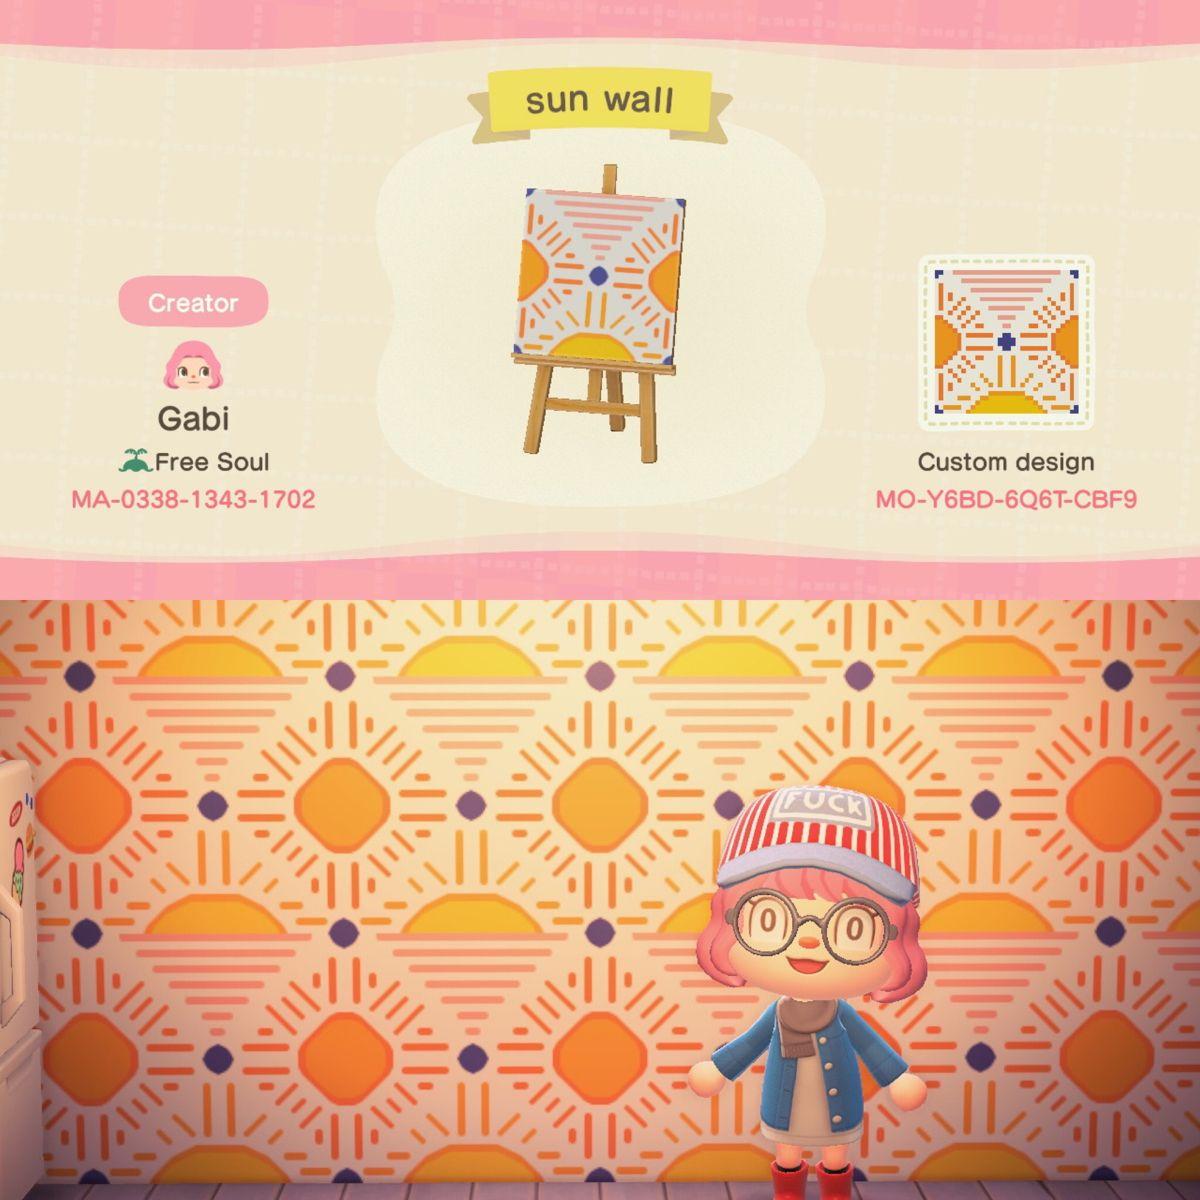 Sun Wallpaper Animal Crossing Desgins Animal Crossing Qr Animal Crossing Animal Crossing Game